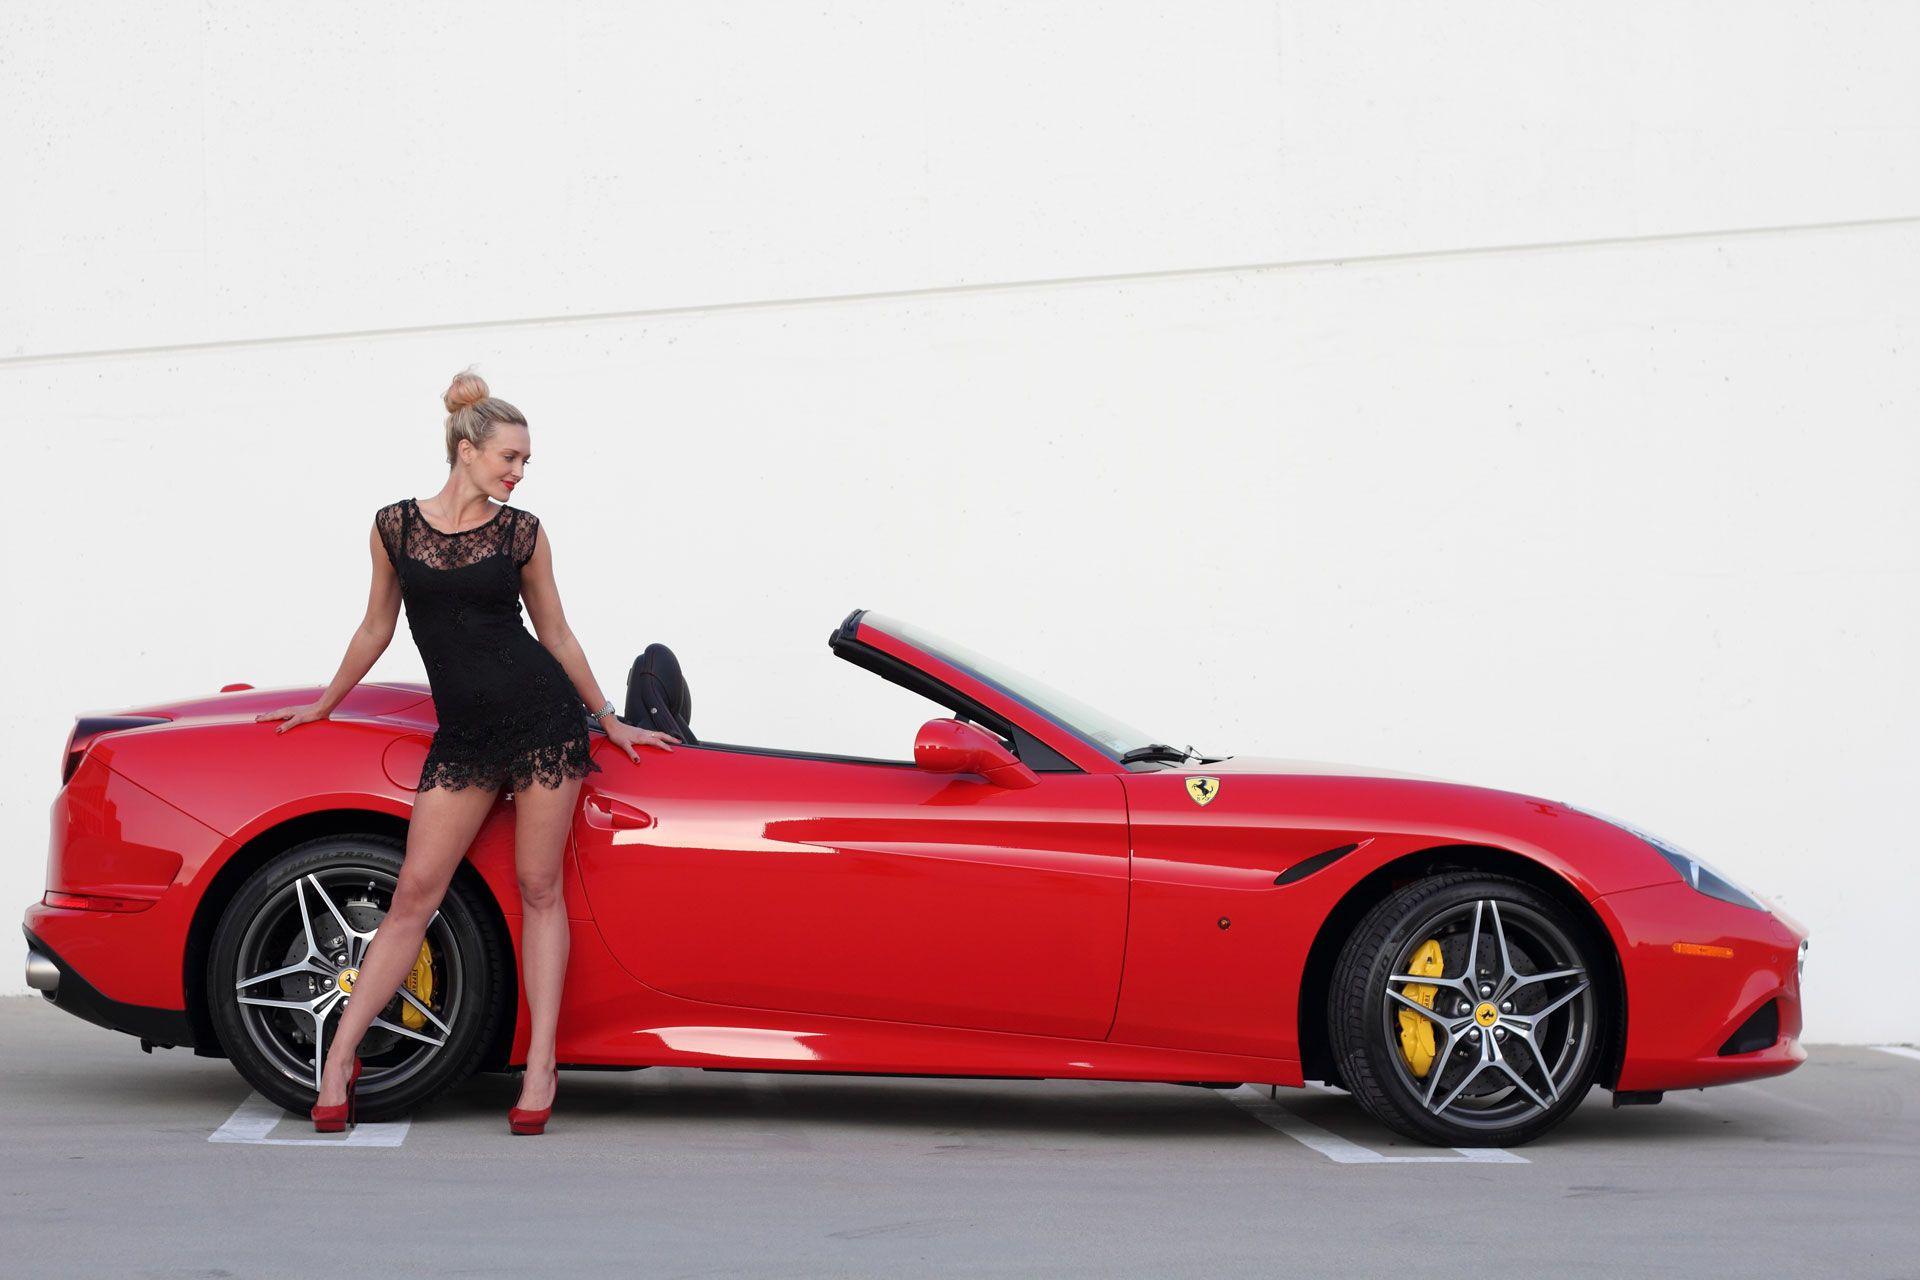 volante new sport aston rome martin ferrari aaa rental hire luxury car vanquish rent